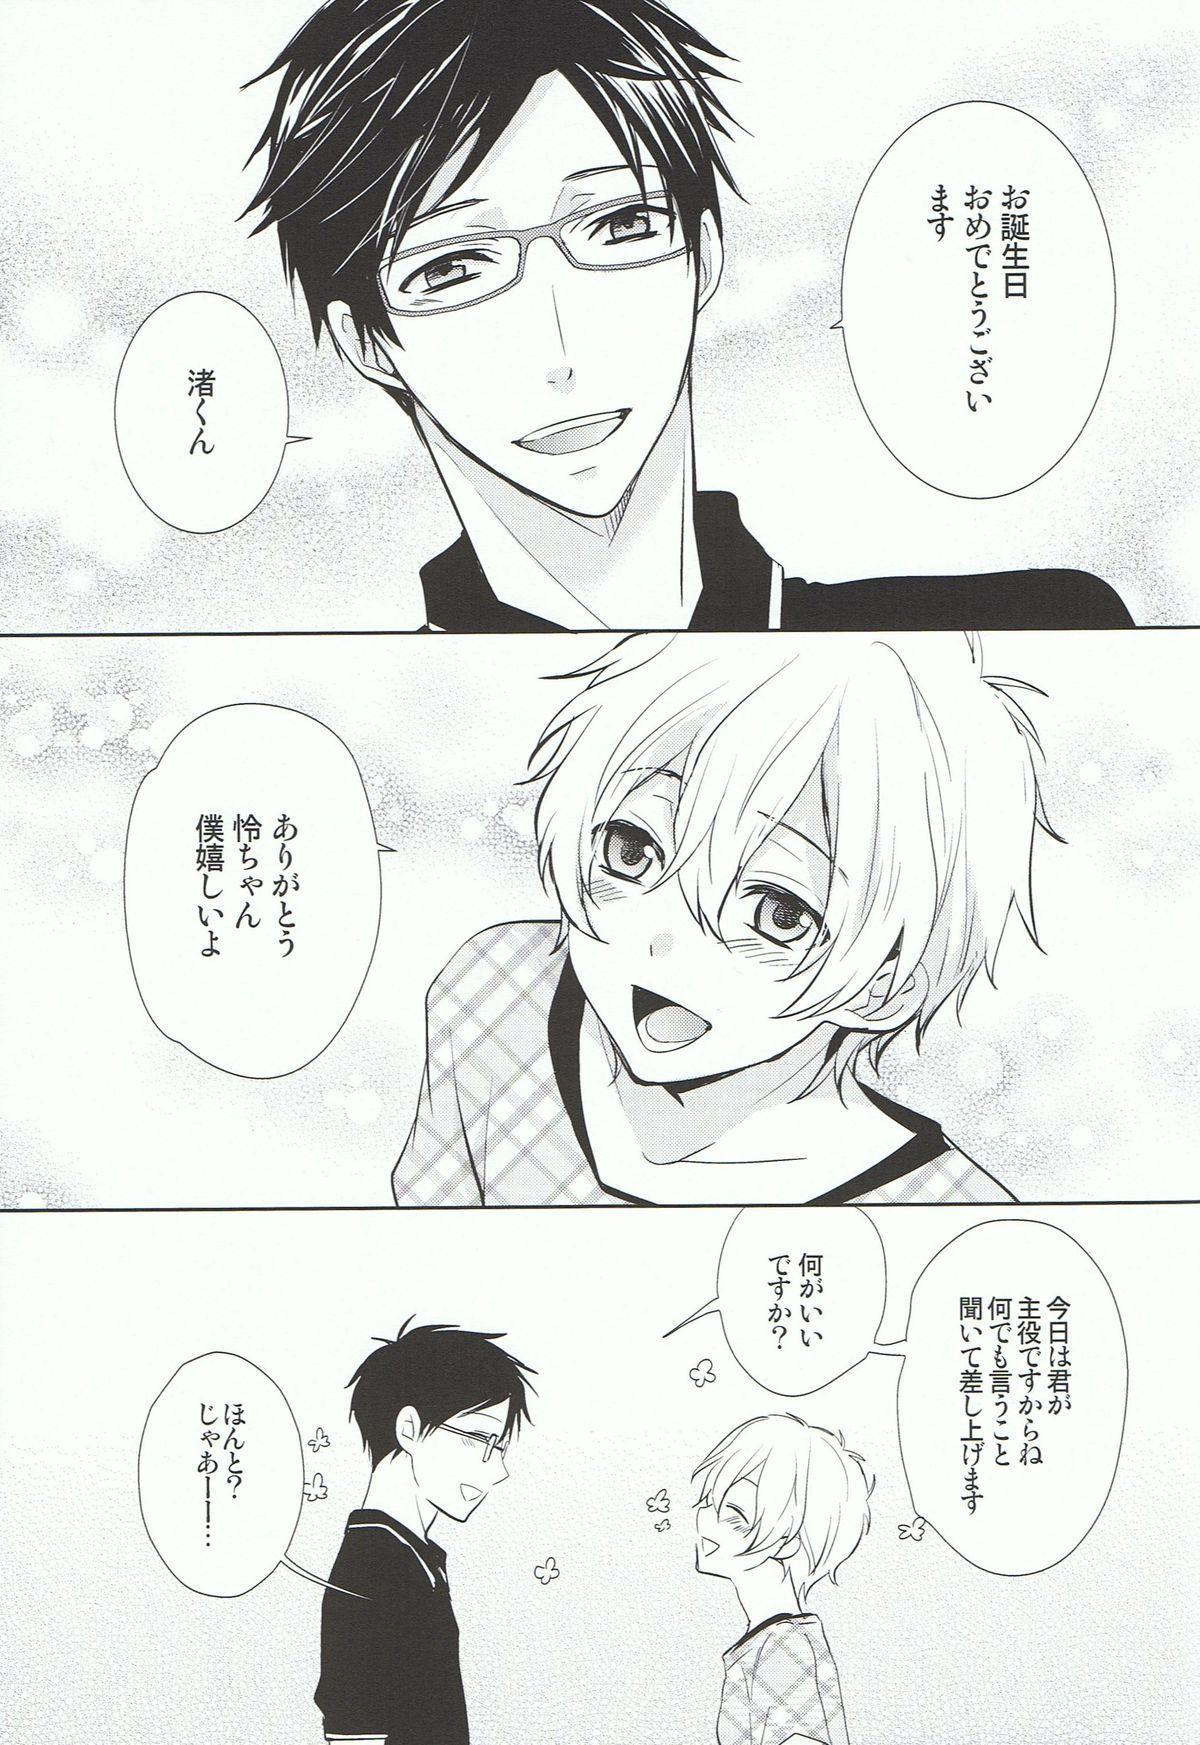 Nagisa-kun de ii deshou! 3